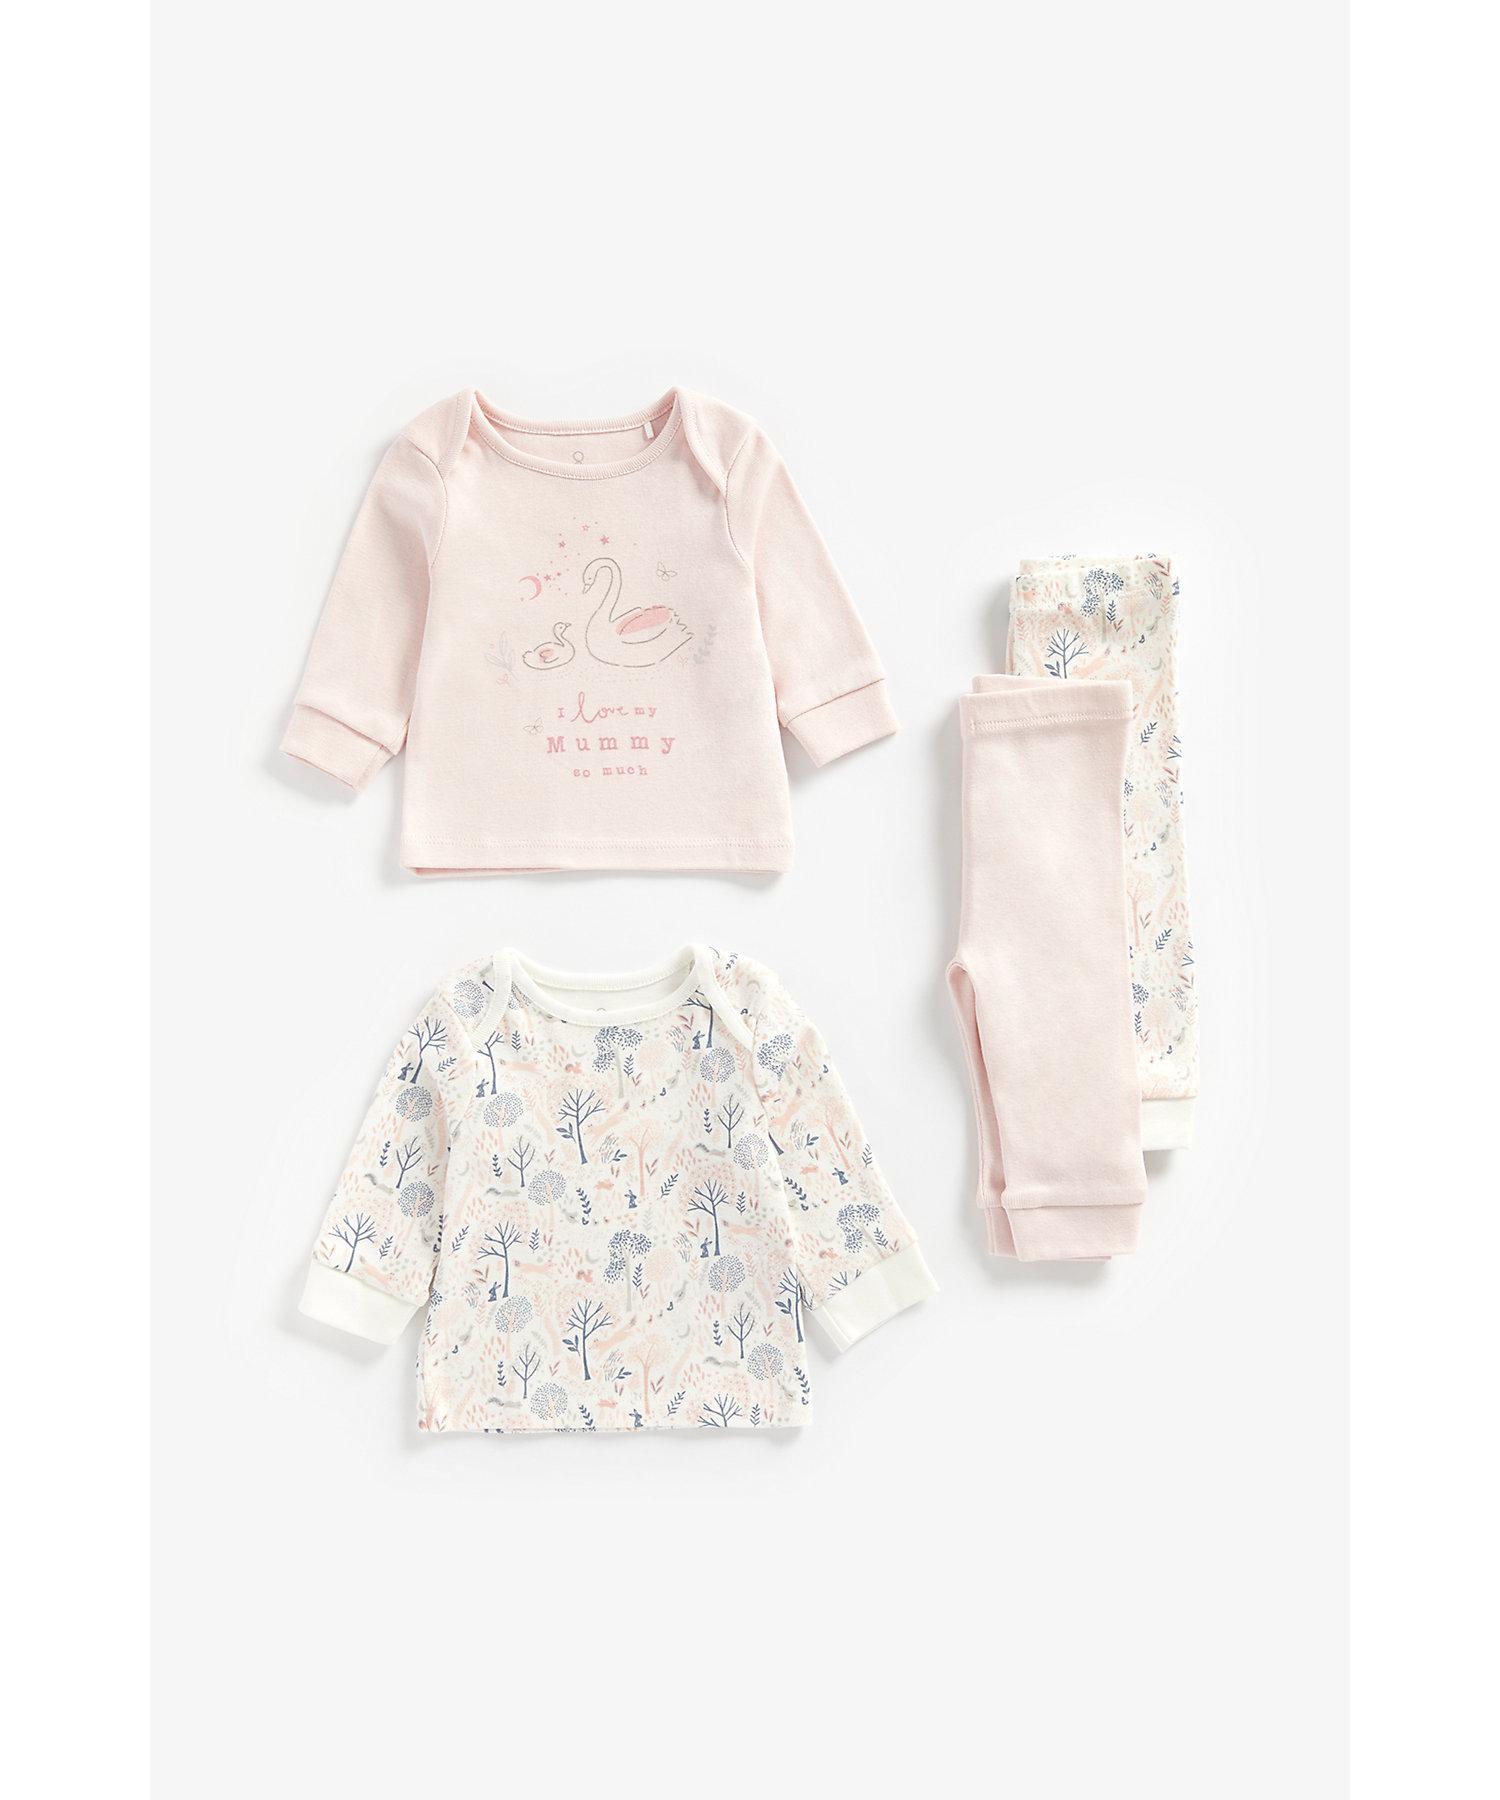 Mothercare | Girls Full Sleeves Pyjama Set Slogan Print - Pack Of 2 - Pink